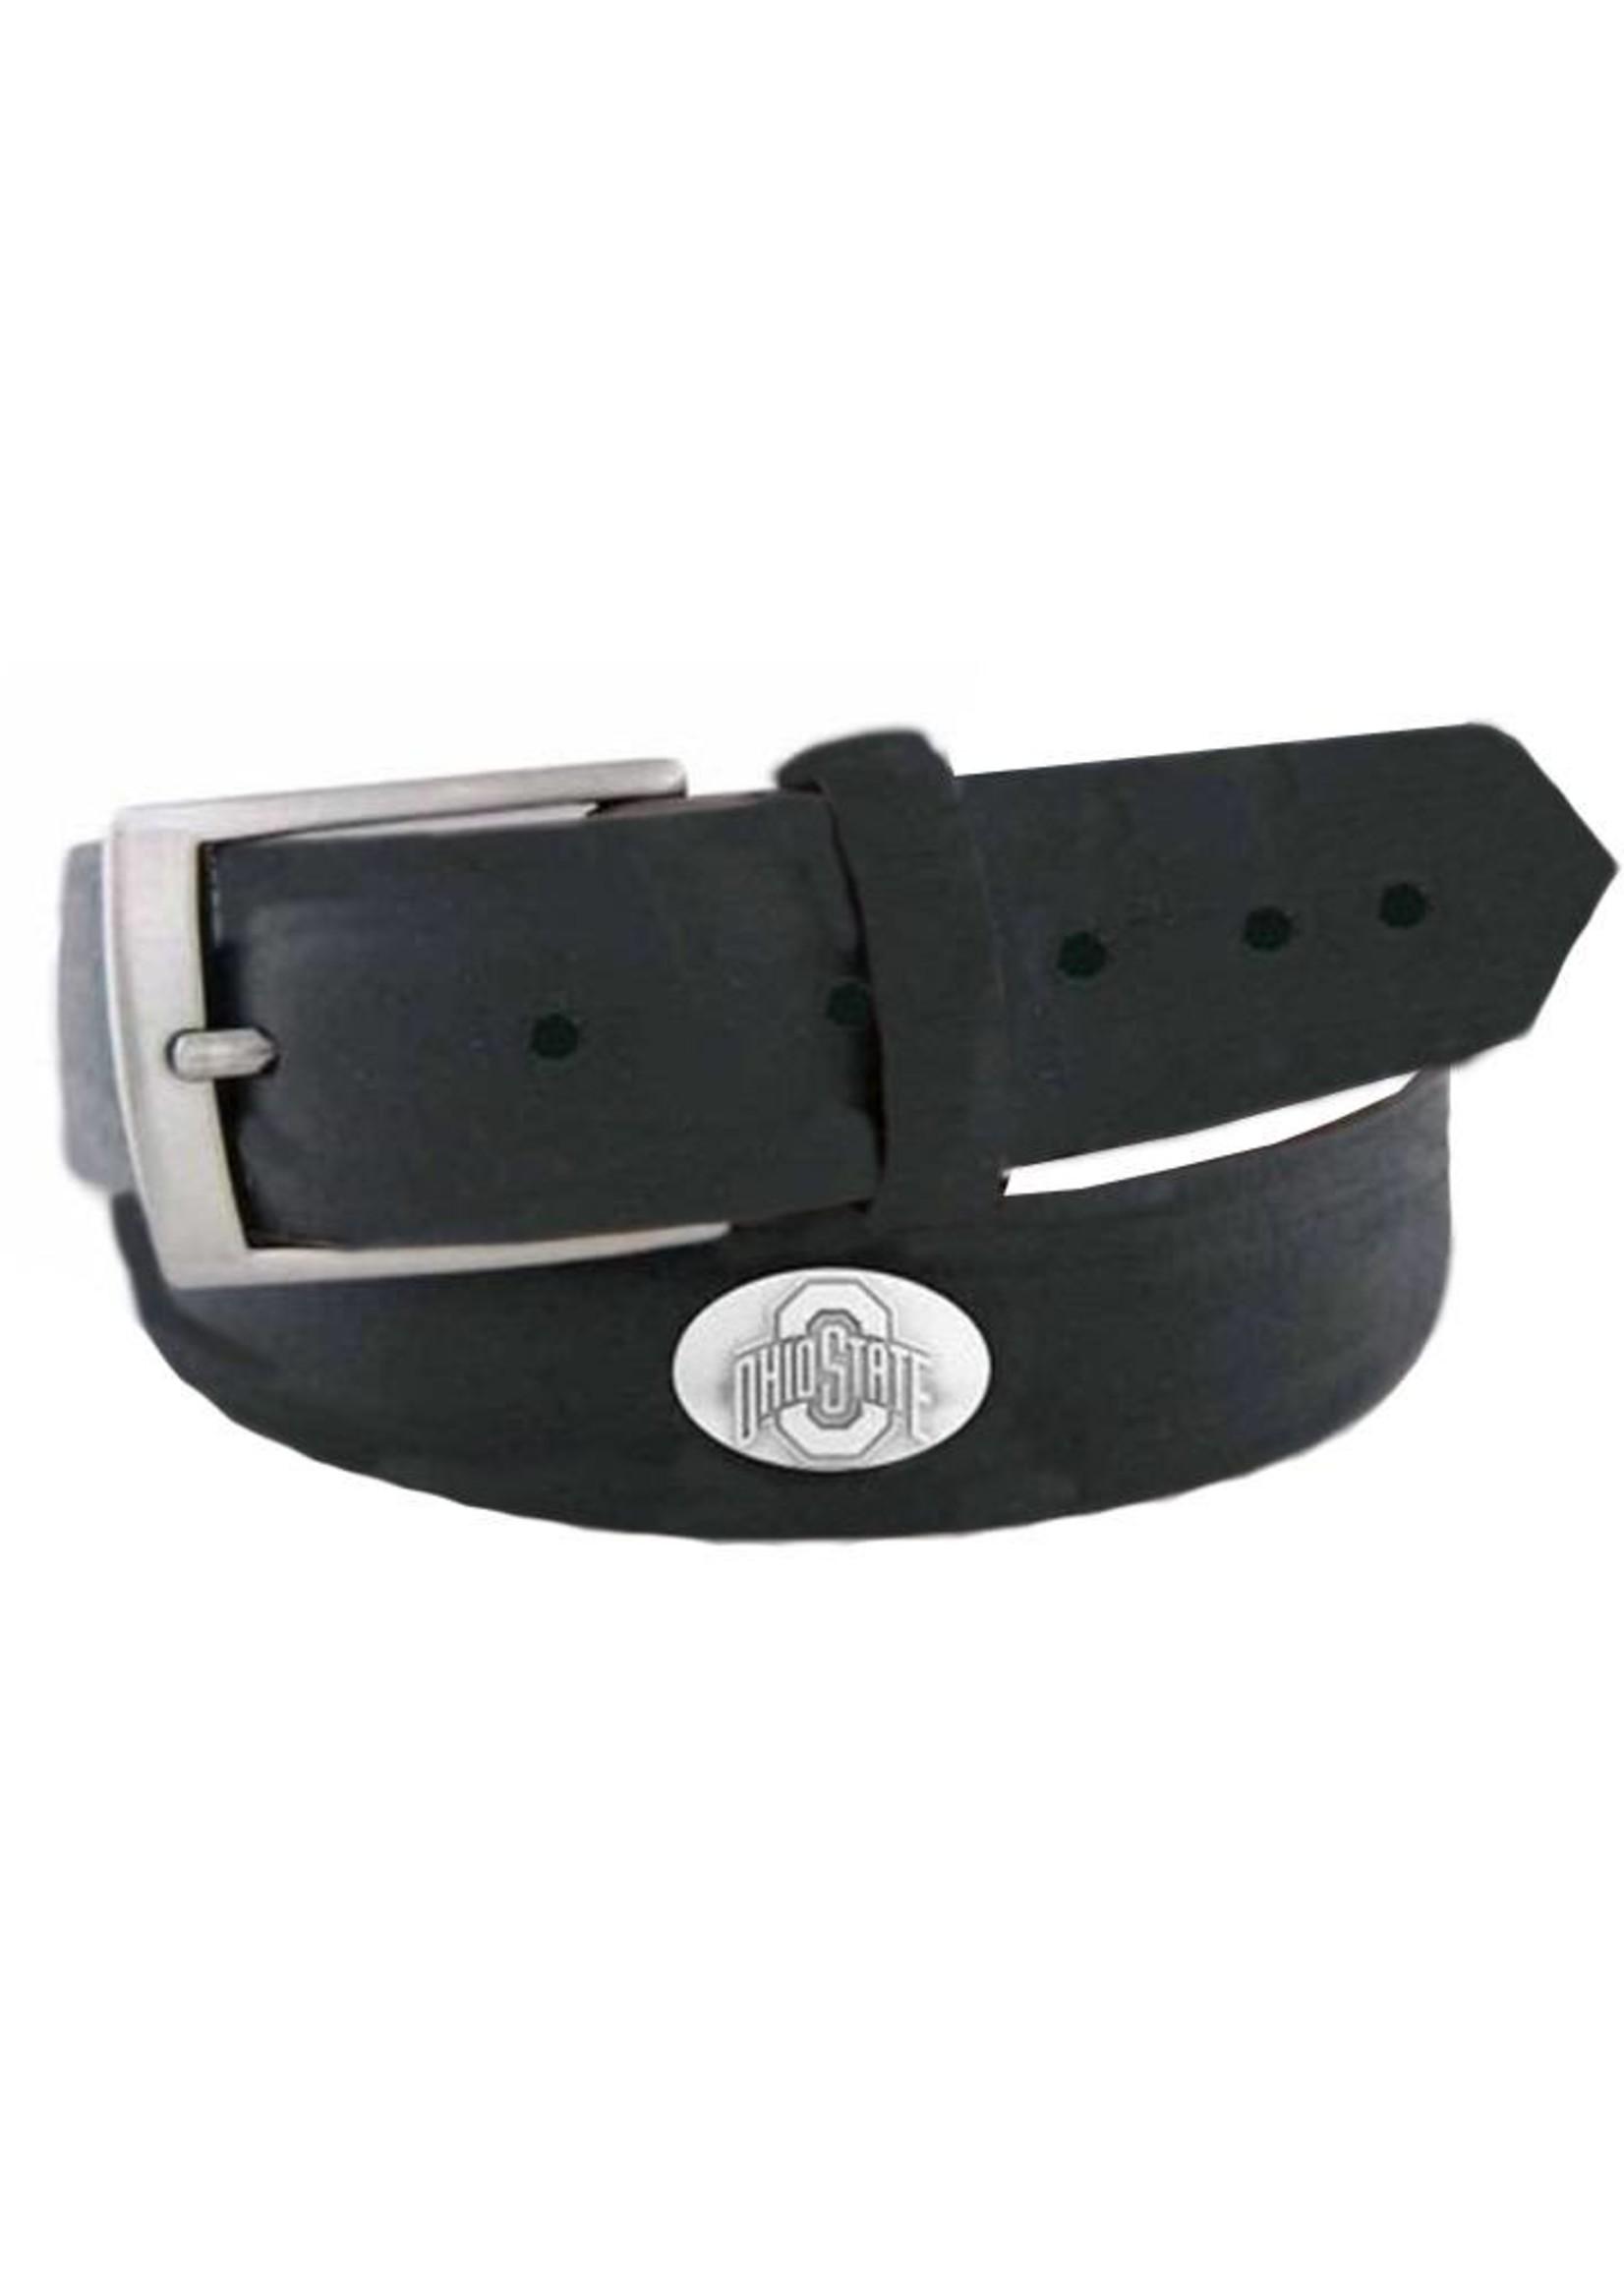 Ohio State Buckeyes Concho Black Leather Belt